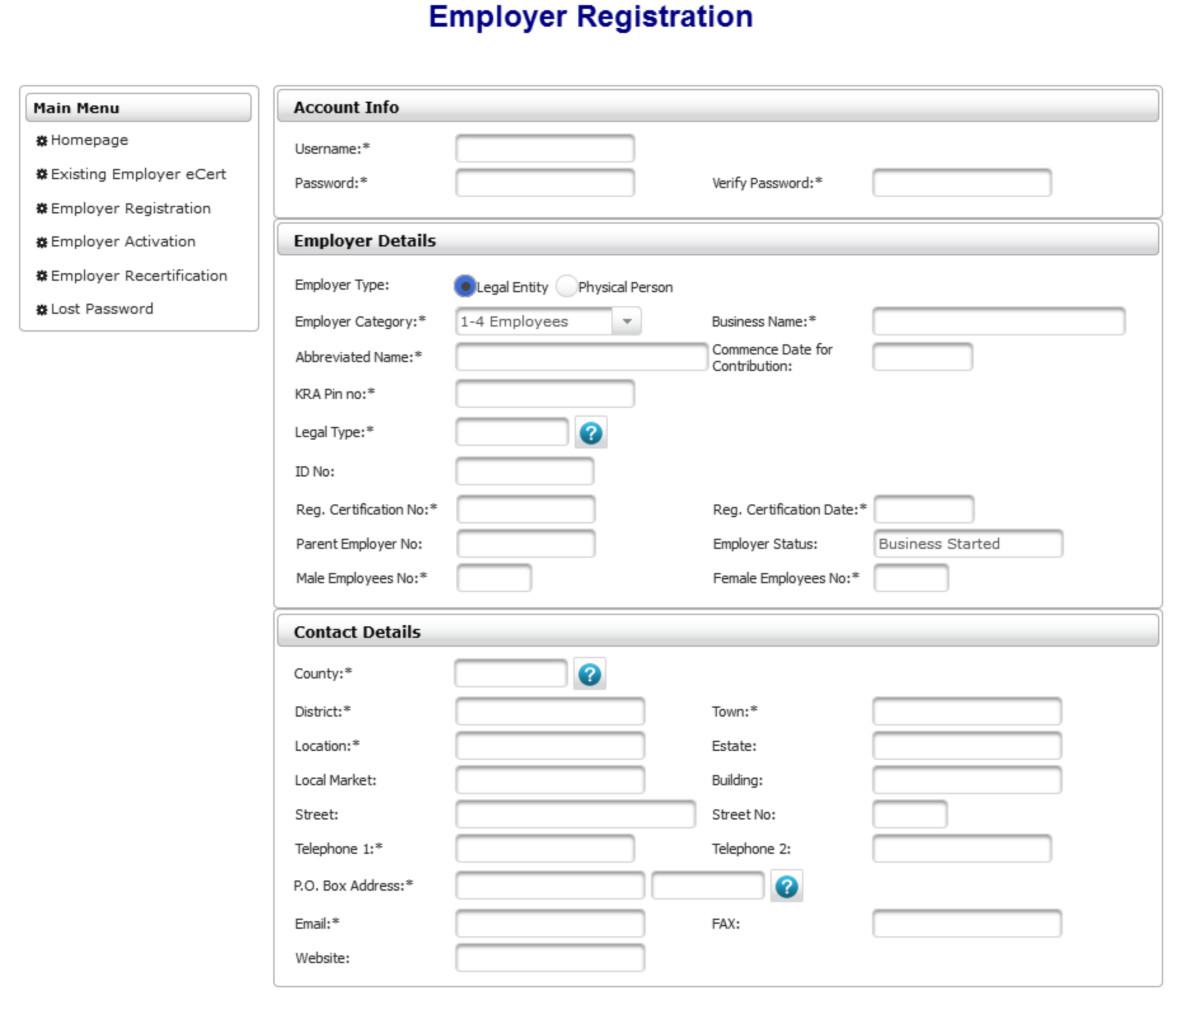 New Employer Registration Form